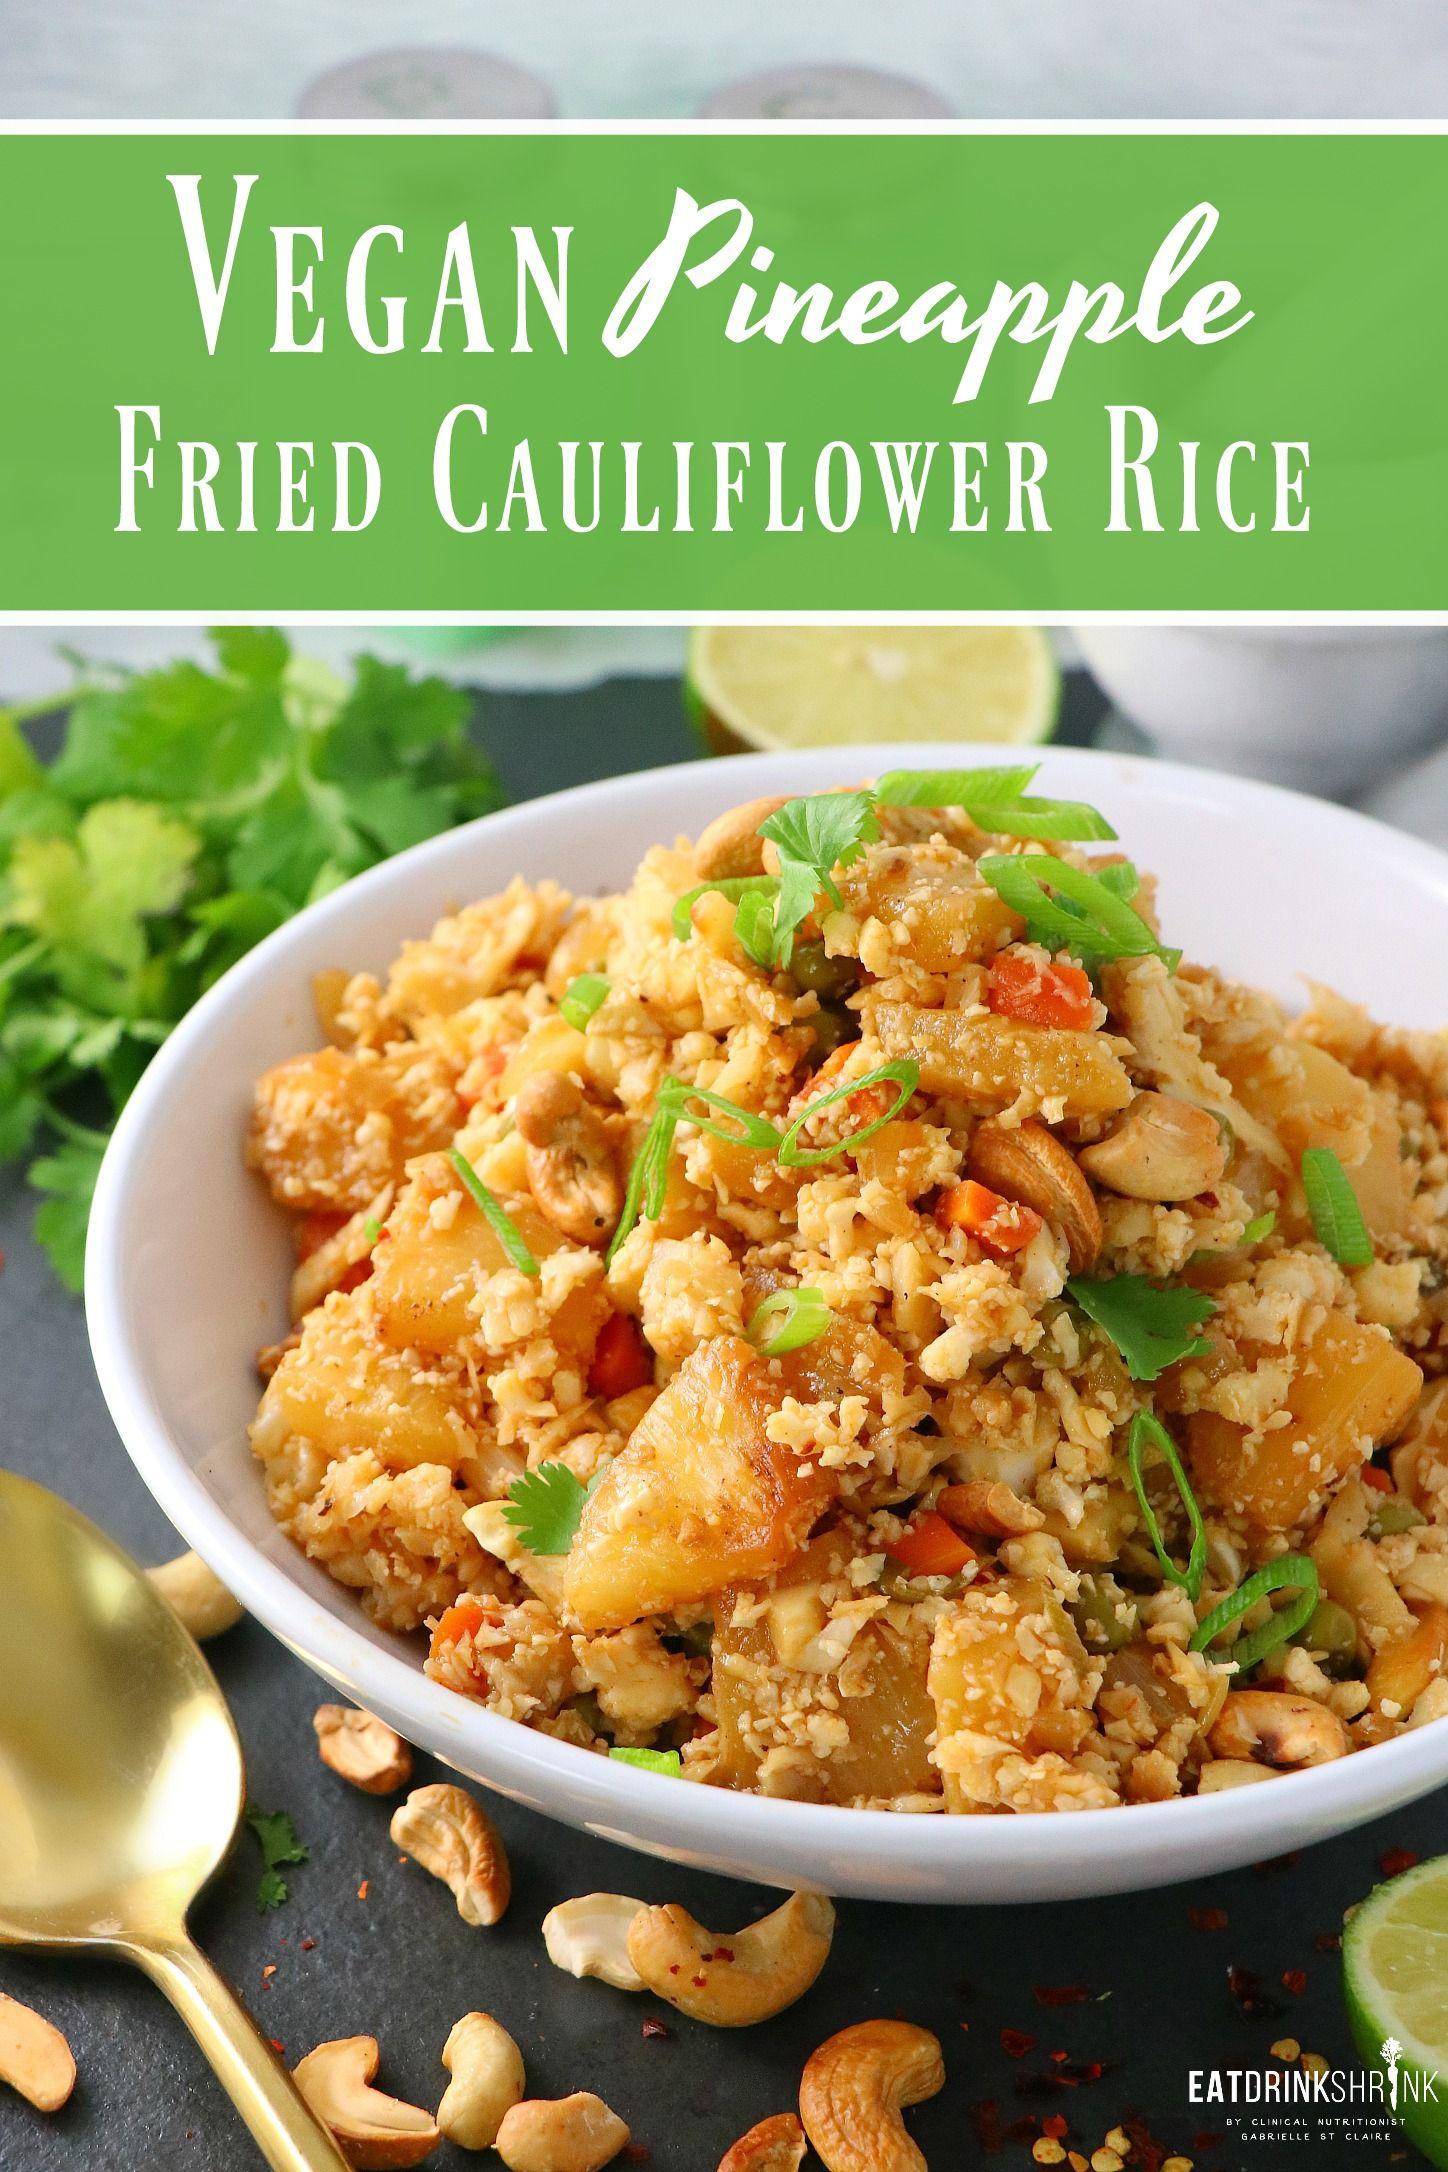 Vegan Recipes With Cauliflower